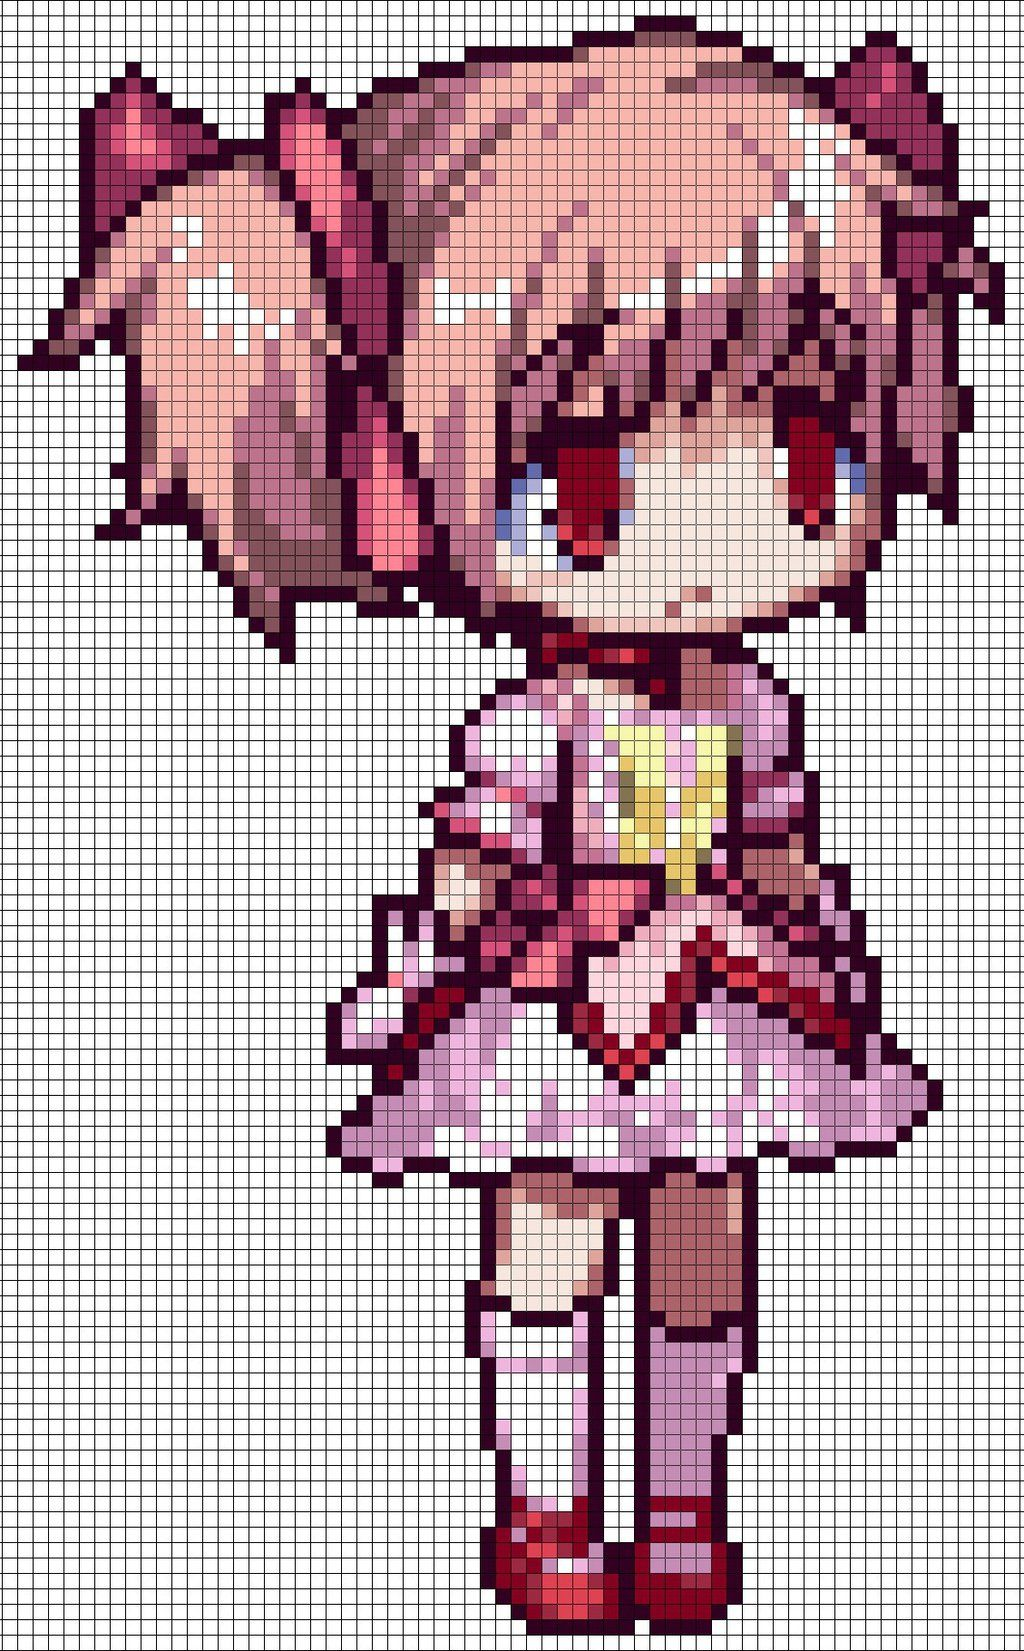 Cute Anime Pixel Art With Grid Pixel Art Grid Gallery